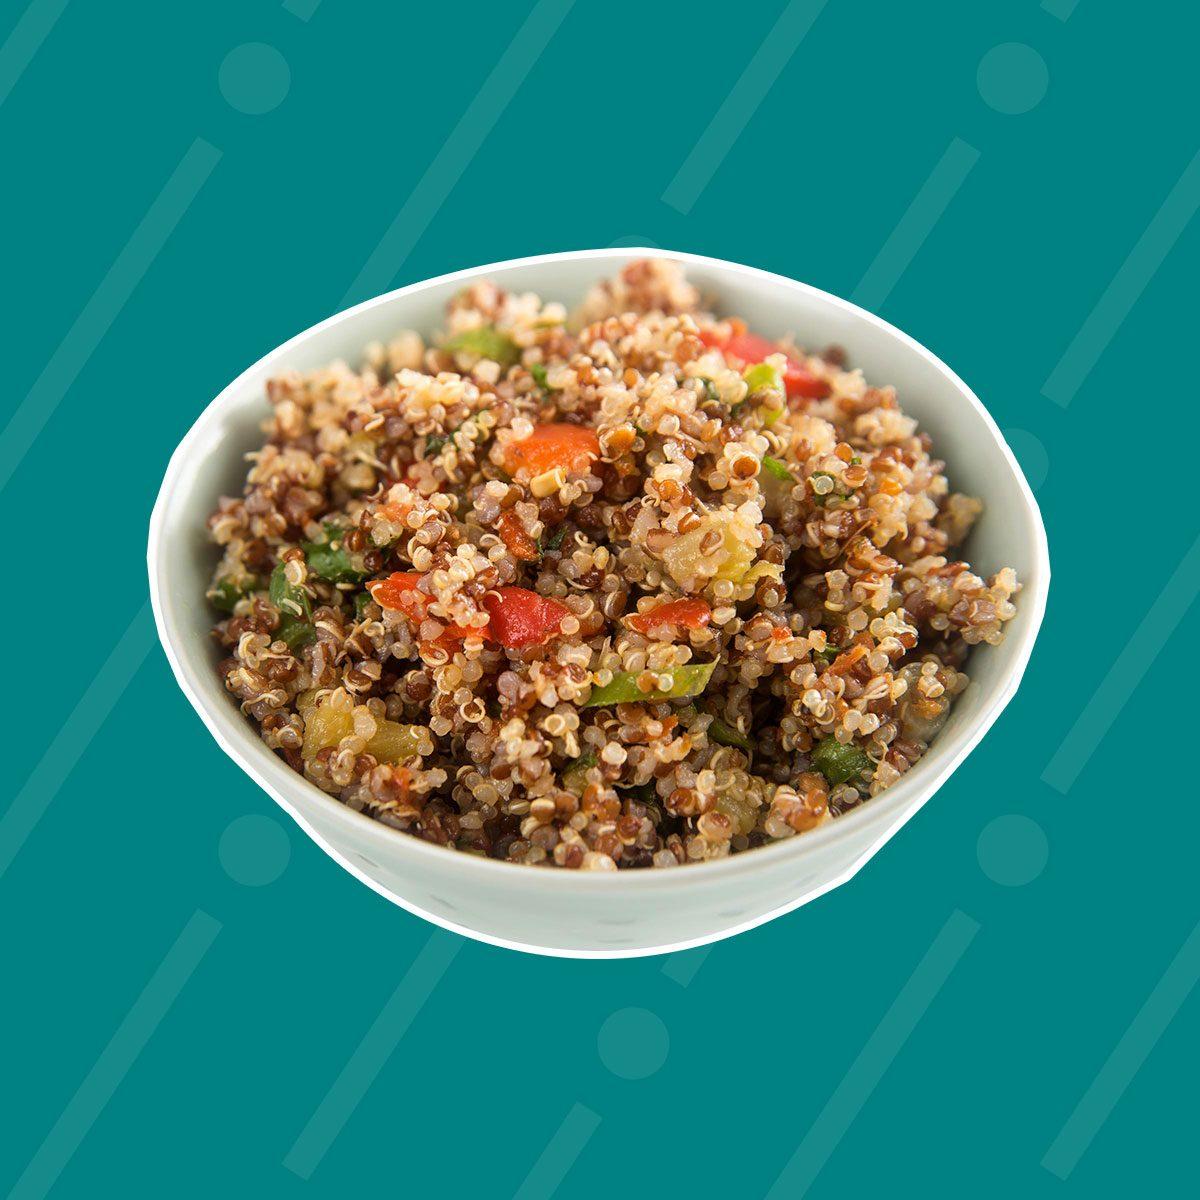 Safeway: O Organics Mediterranean Style Quinoa with Brown Rice